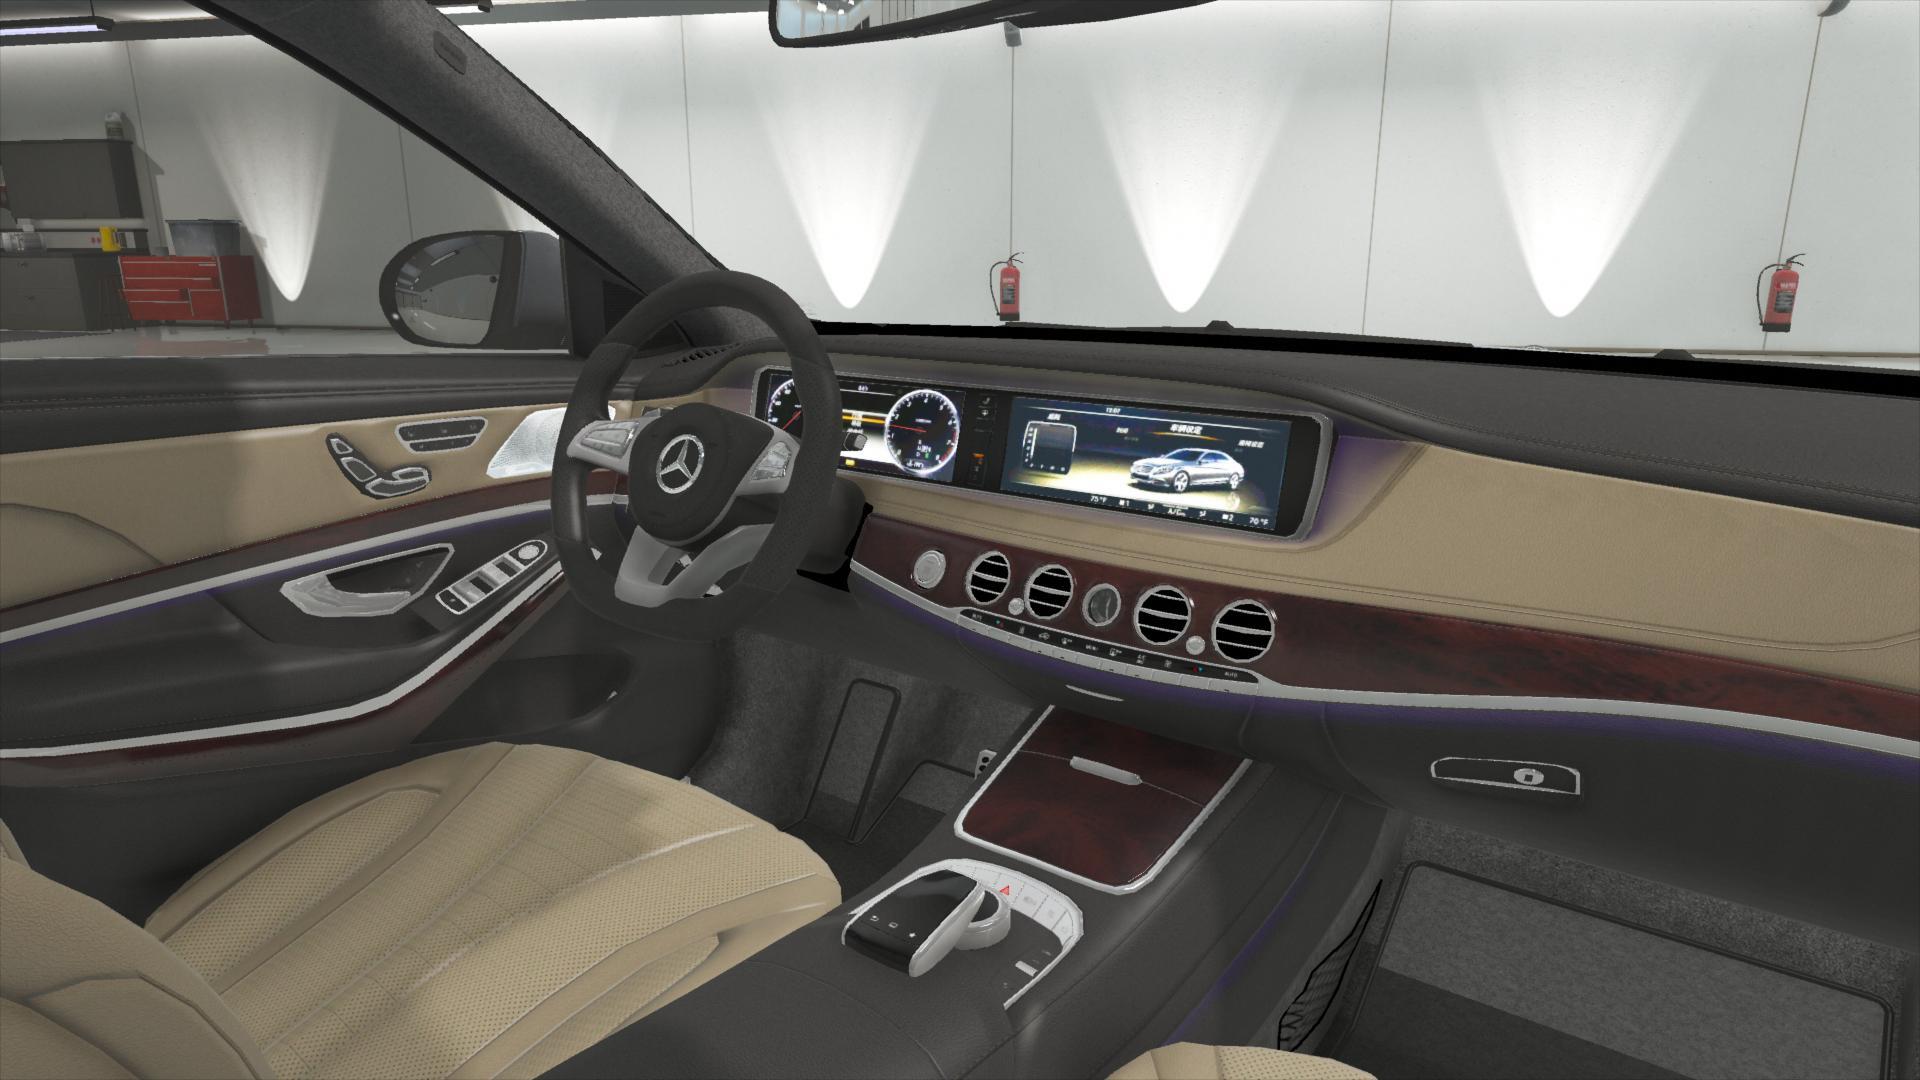 walkaround mercedes s exterior watch auto class youtube and show benz interior ottawa